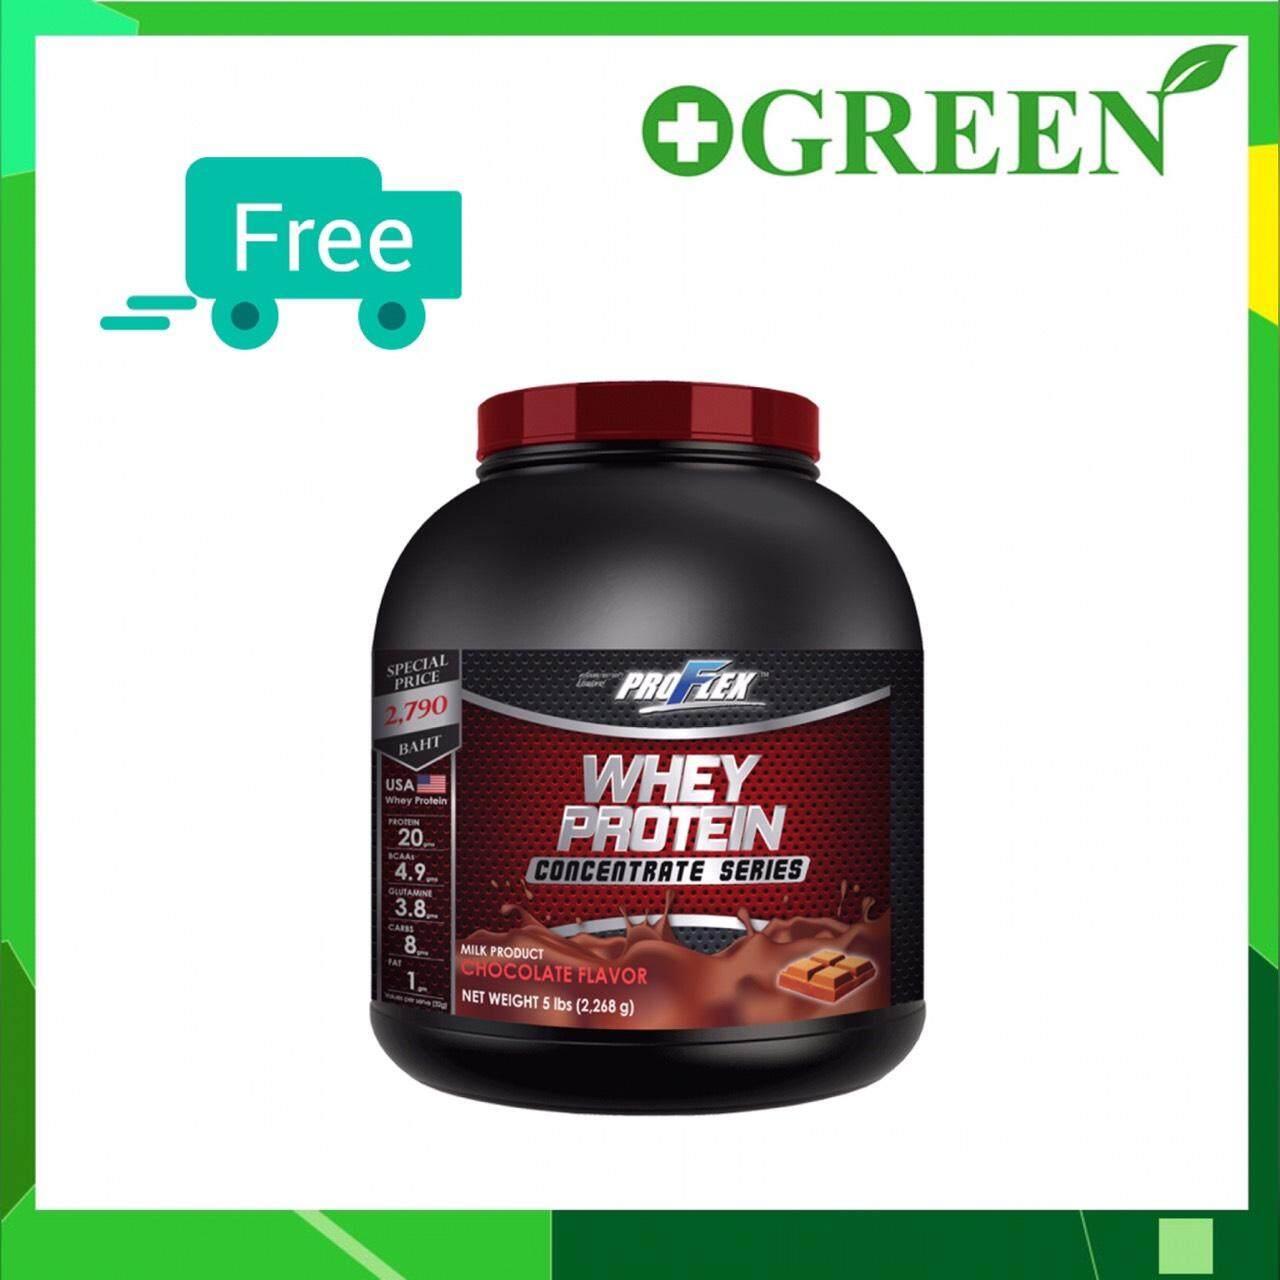 Proflex Whey Protein Concentrate Chocolate 5 lbs โปรเฟล็กซ์ เวย์โปรตีน คอนเซนเตรท รสช็อคโกแลต ขนาด 5 ปอนด์